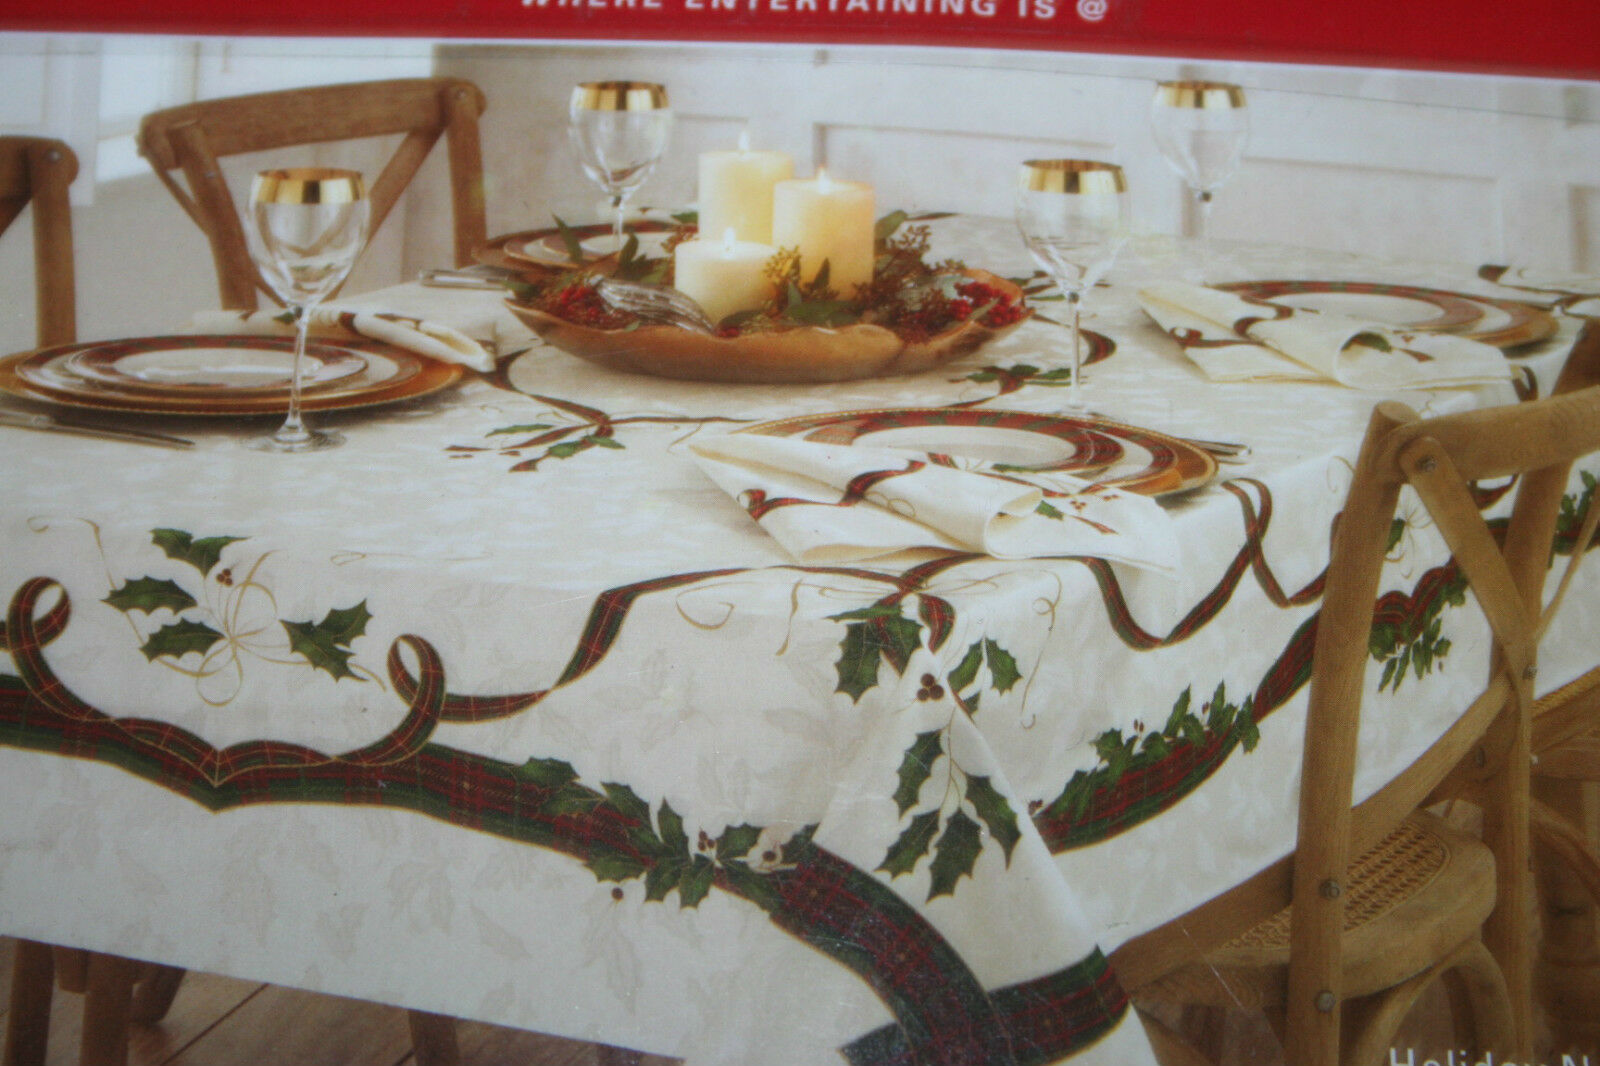 Lenox Holiday Nouveau NATALE TOVAGLIA, Panno Da Tavola 152 x 264 cm